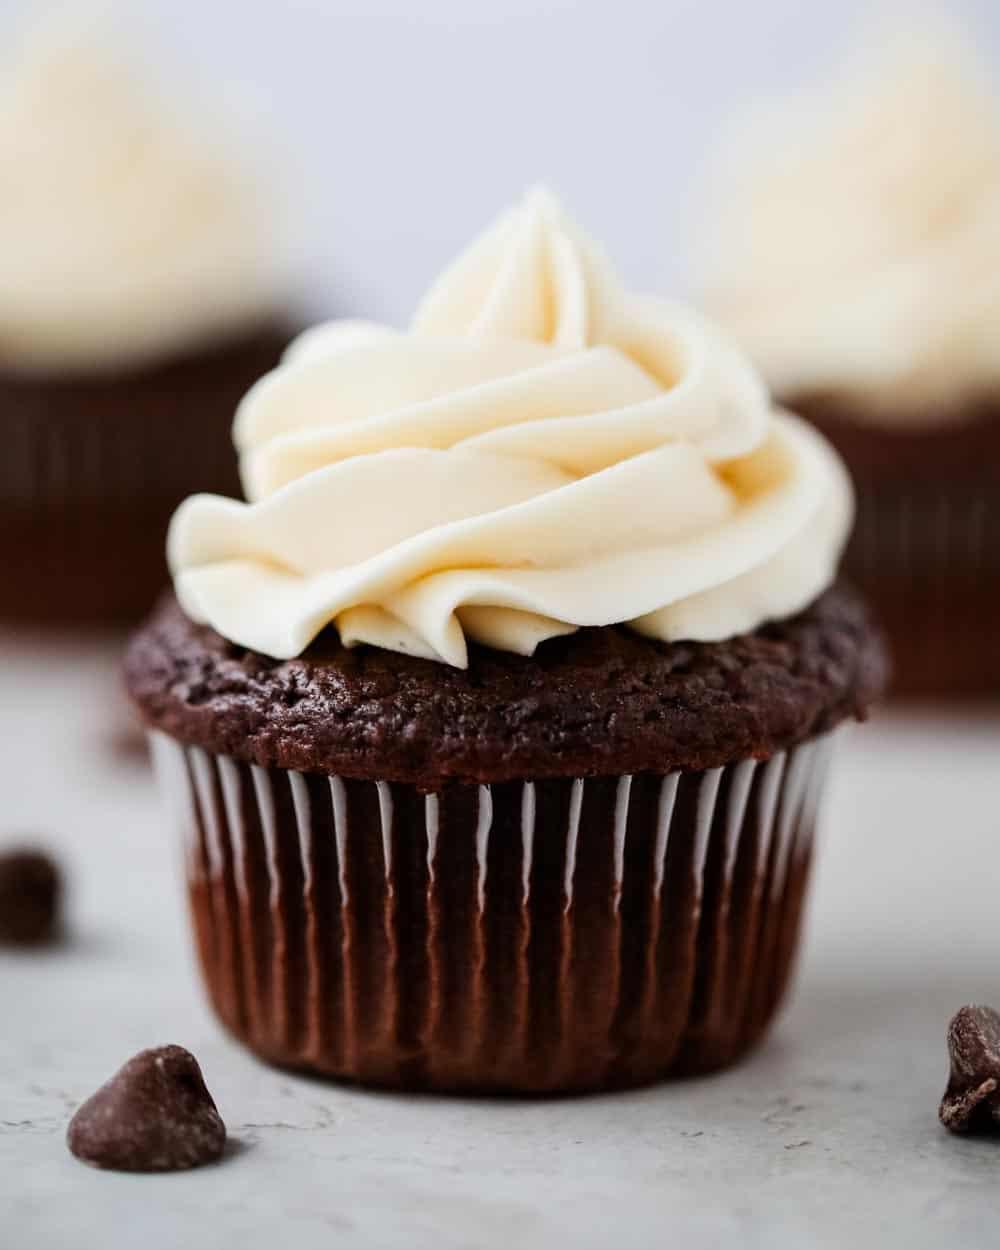 Chocolate-cupcakes With Vanilla